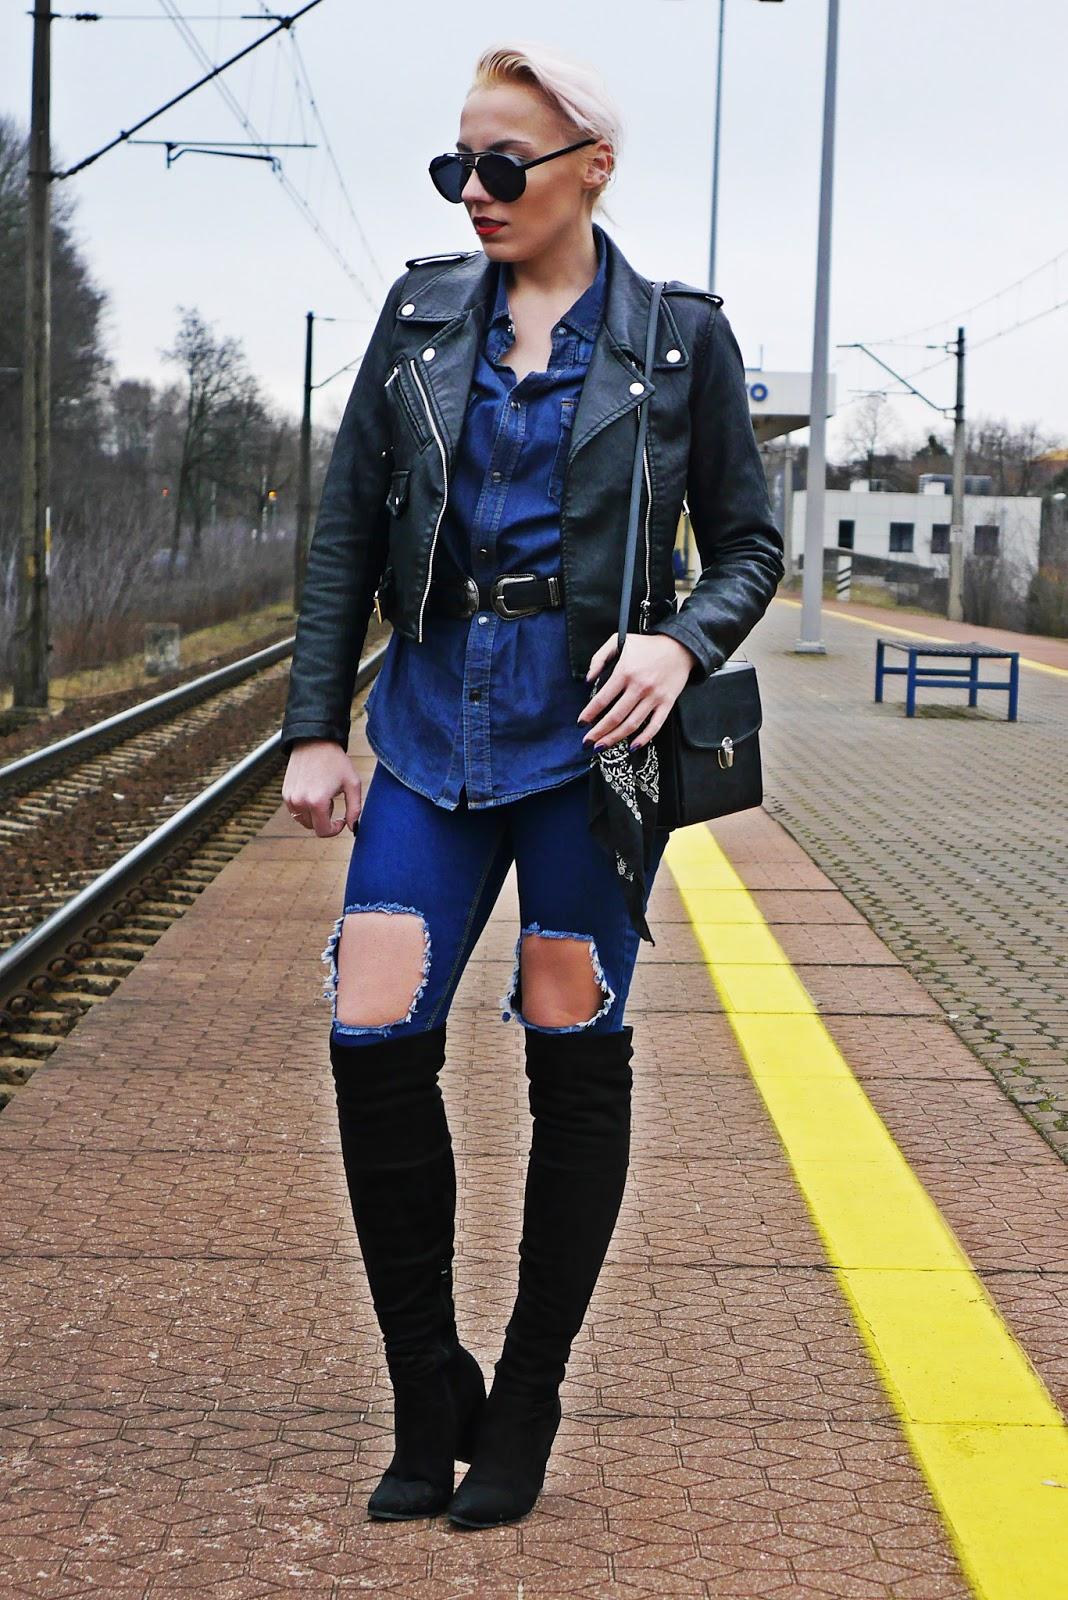 jeansowa_koszula_czarna_ramoneska_kozaki_z_kolano_karyn_look_230217d